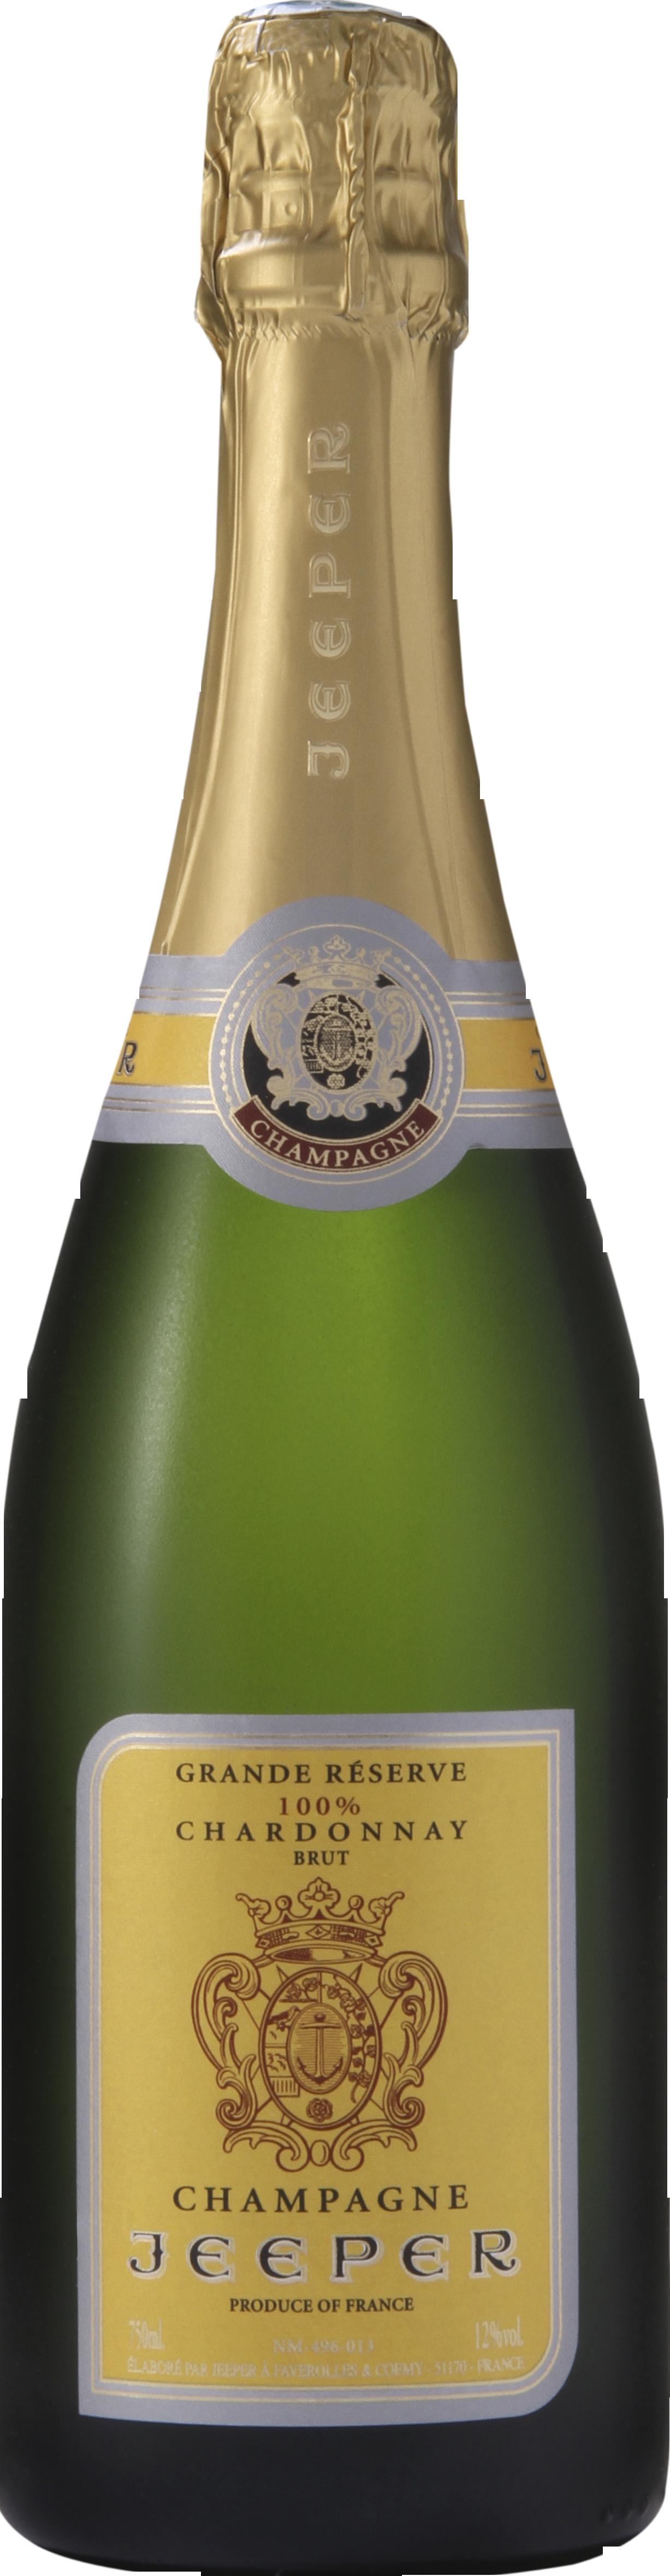 Champagne  Bottle PNG Image